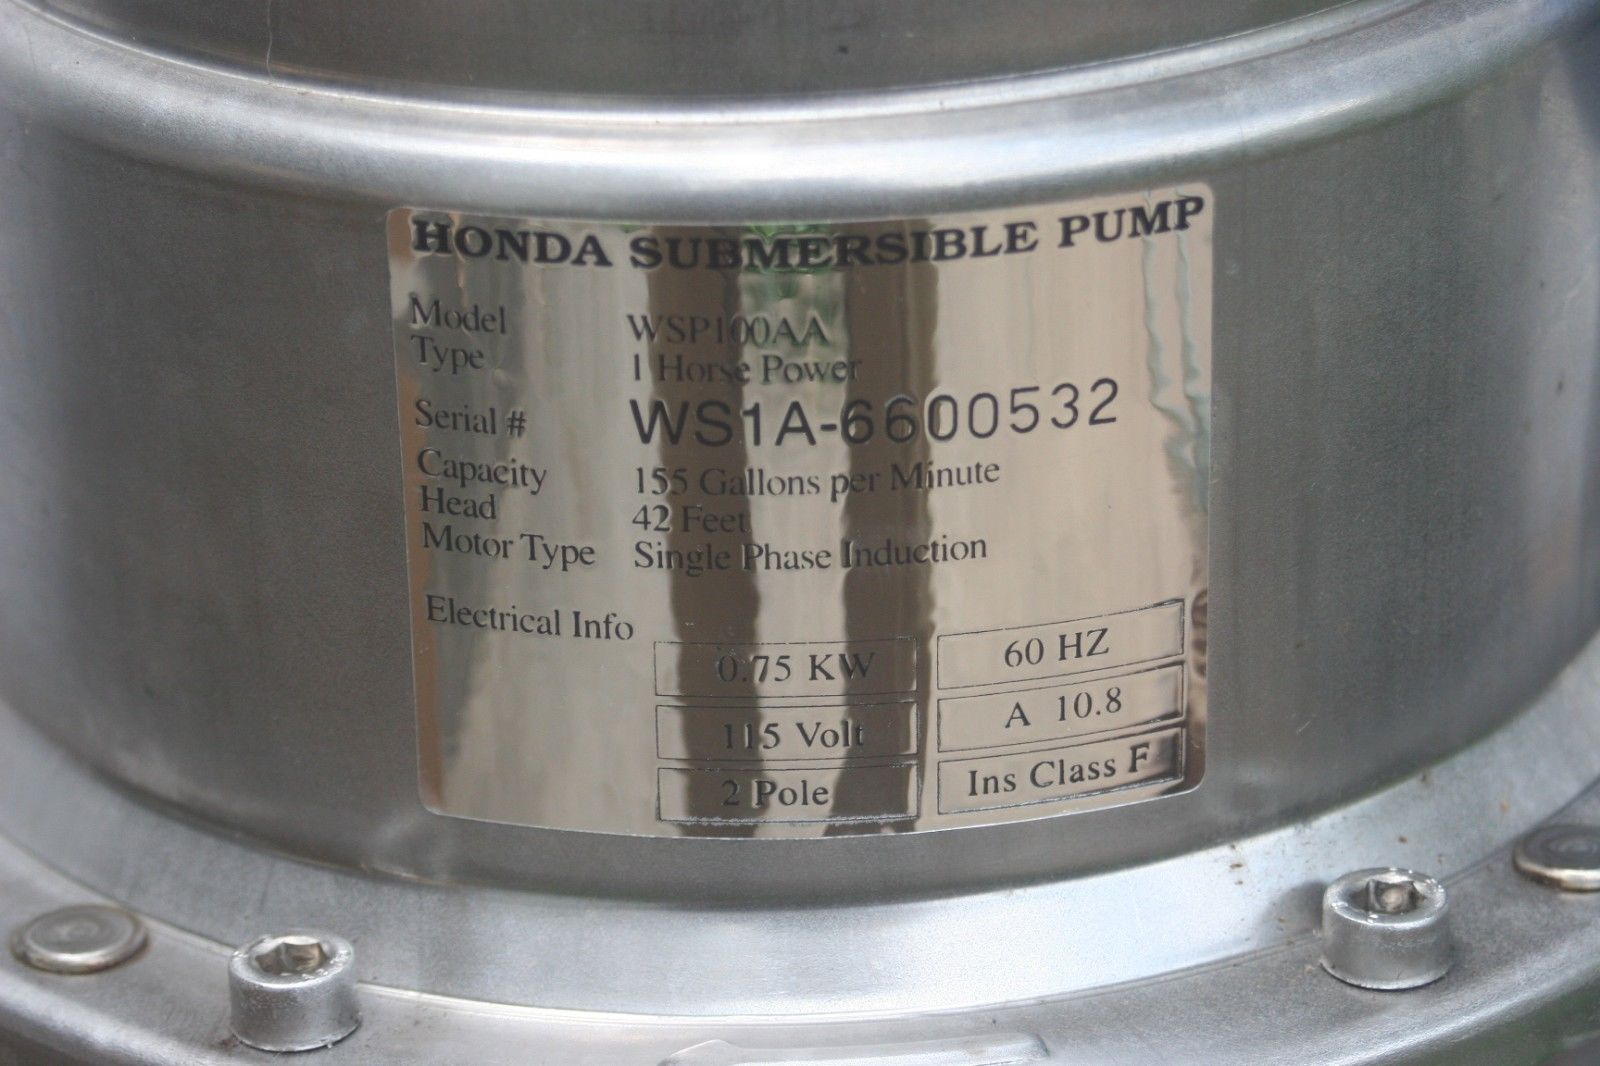 Honda Power Equipment WSP100AA Industrial Submersible Electric Trash Pump 1HP